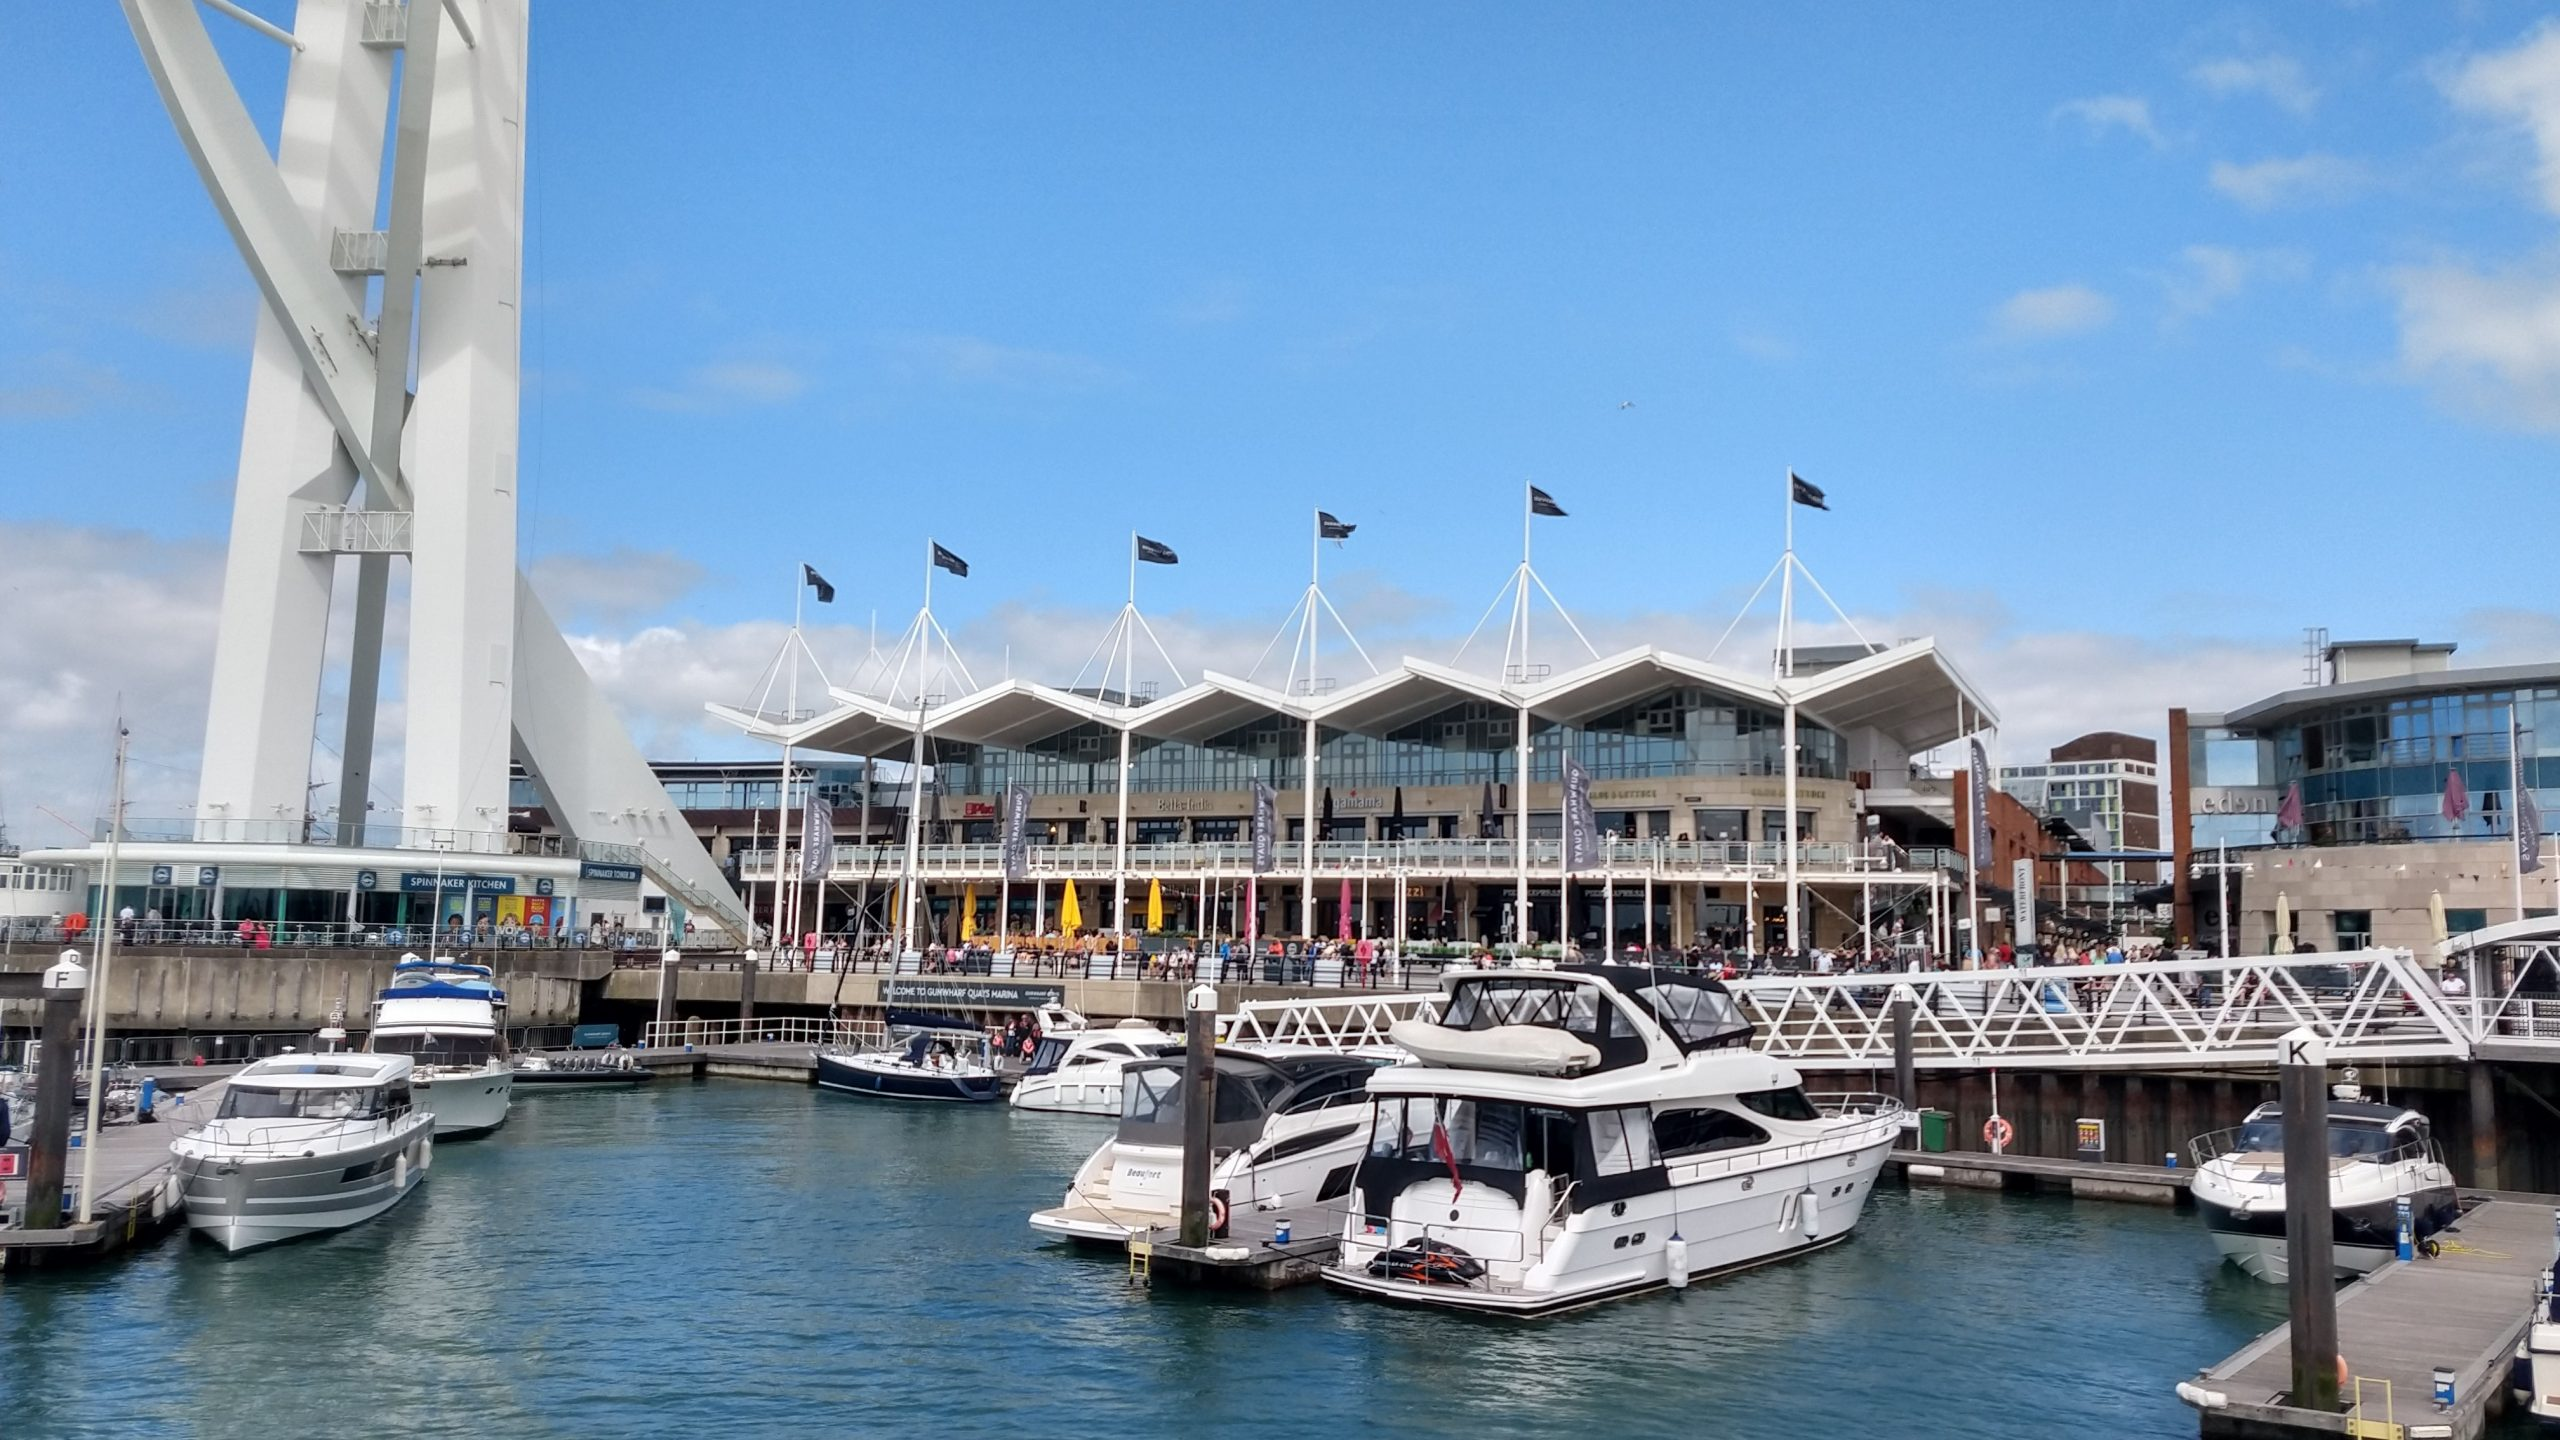 Harbour Tour, Portsmouth Historic Dockyard, museum